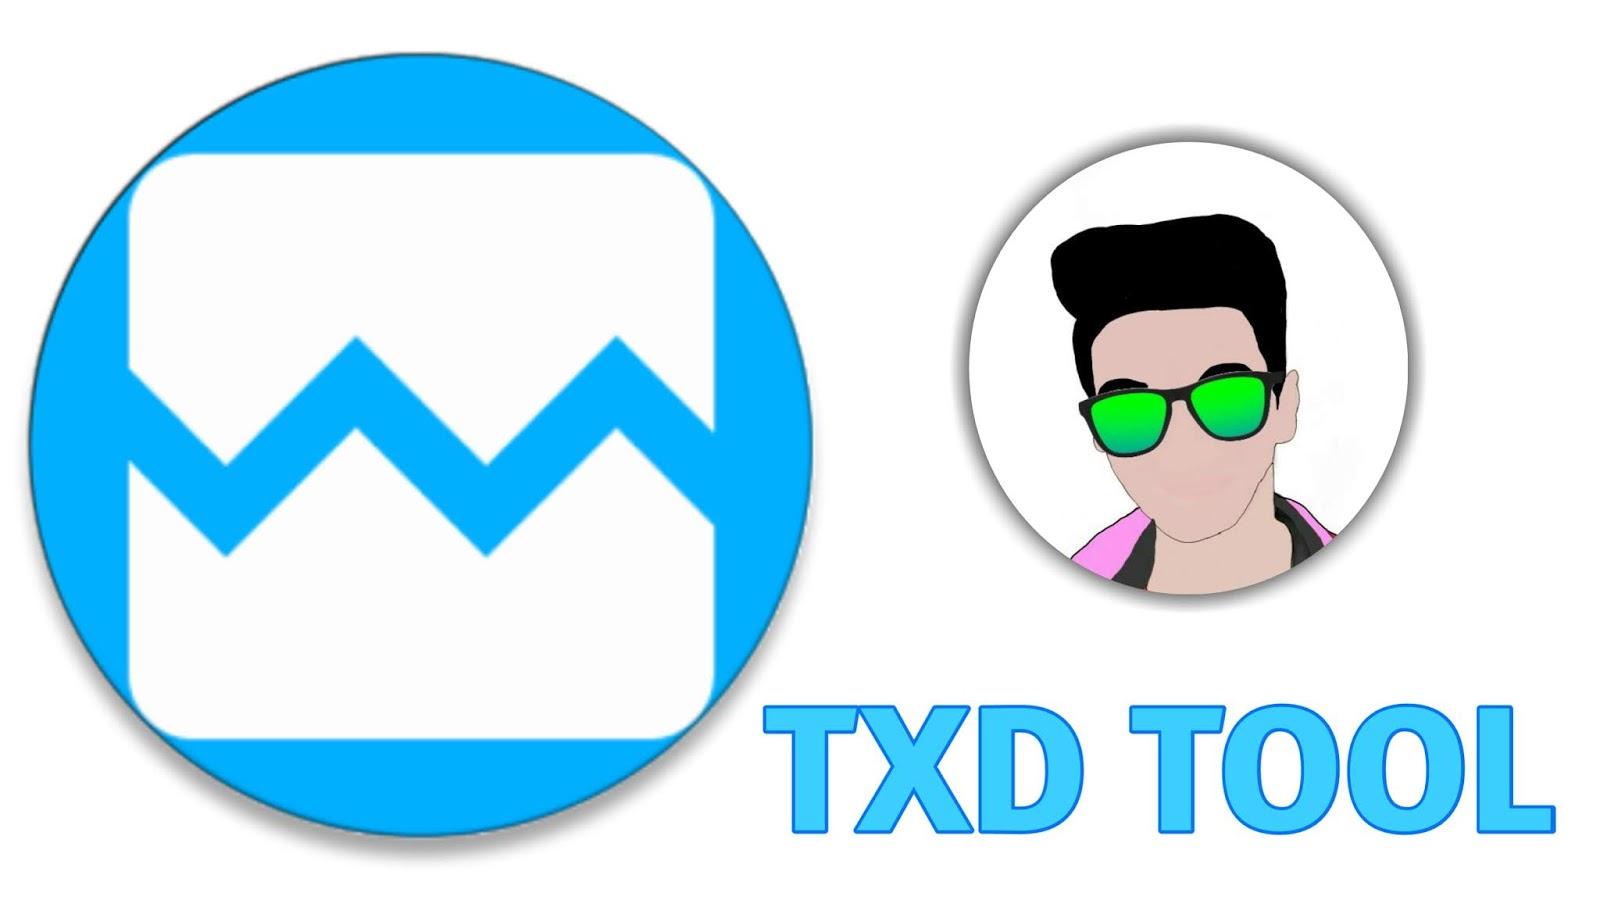 TXD TOOL Android - Techy Harsh